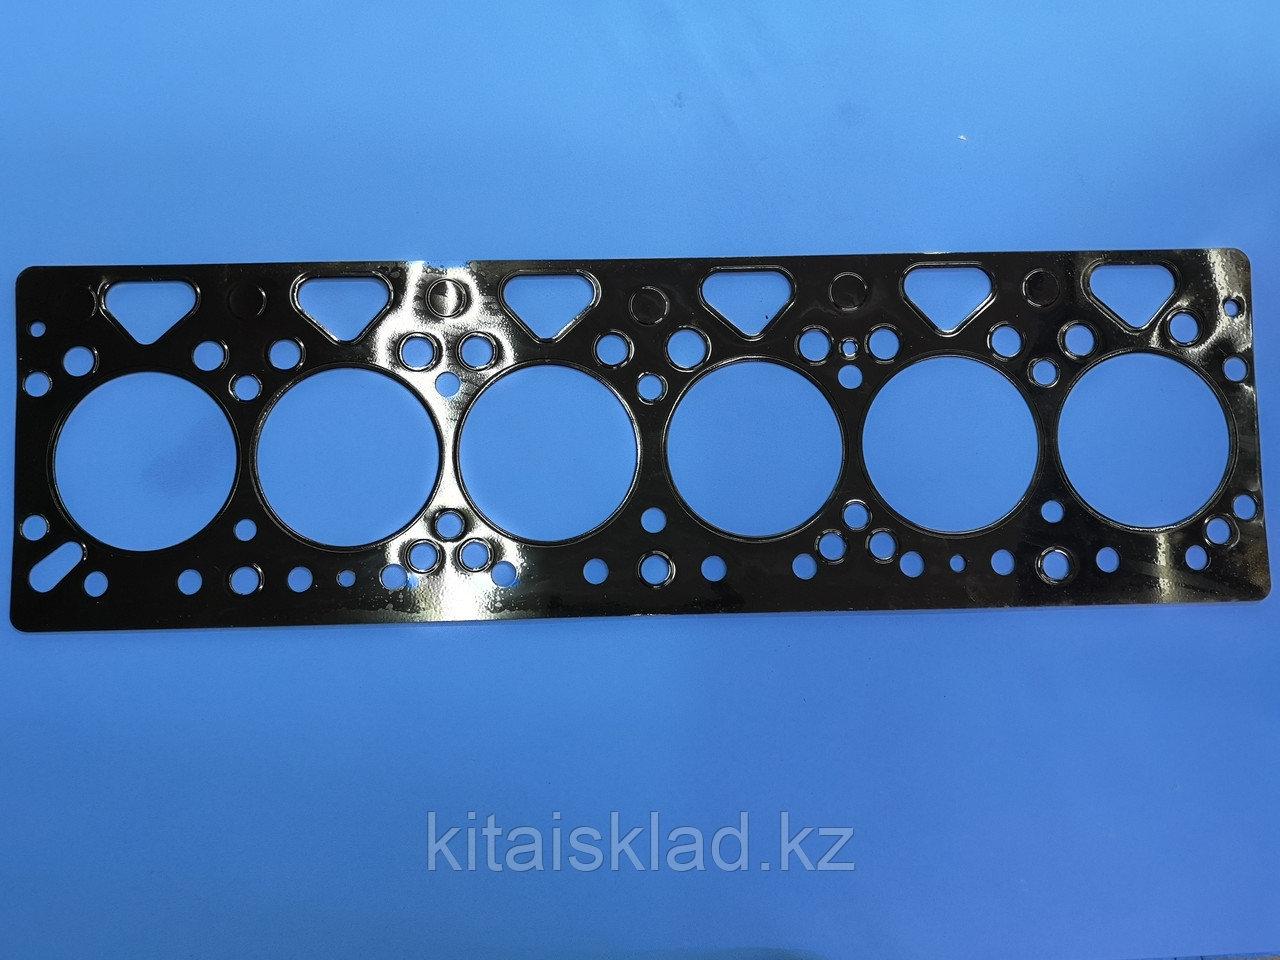 Прокладка ГБЦ (головки блока цилиндров) T3681H208B Perkins/Phaser 160 металл